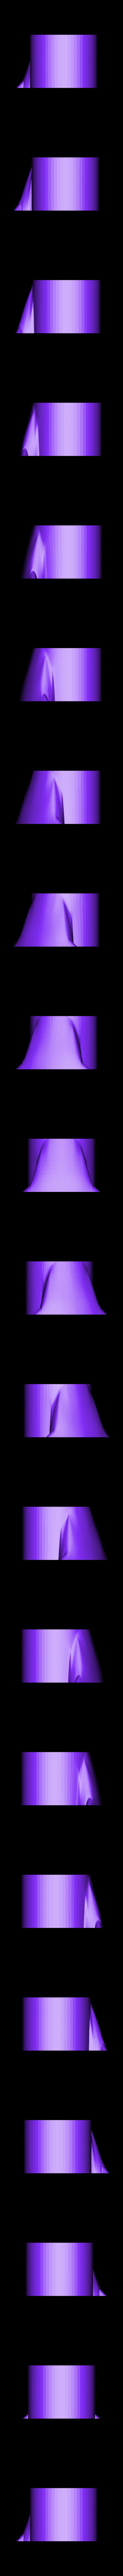 Mid1.STL Download STL file Phenom 300 • Template to 3D print, Eduardohbm